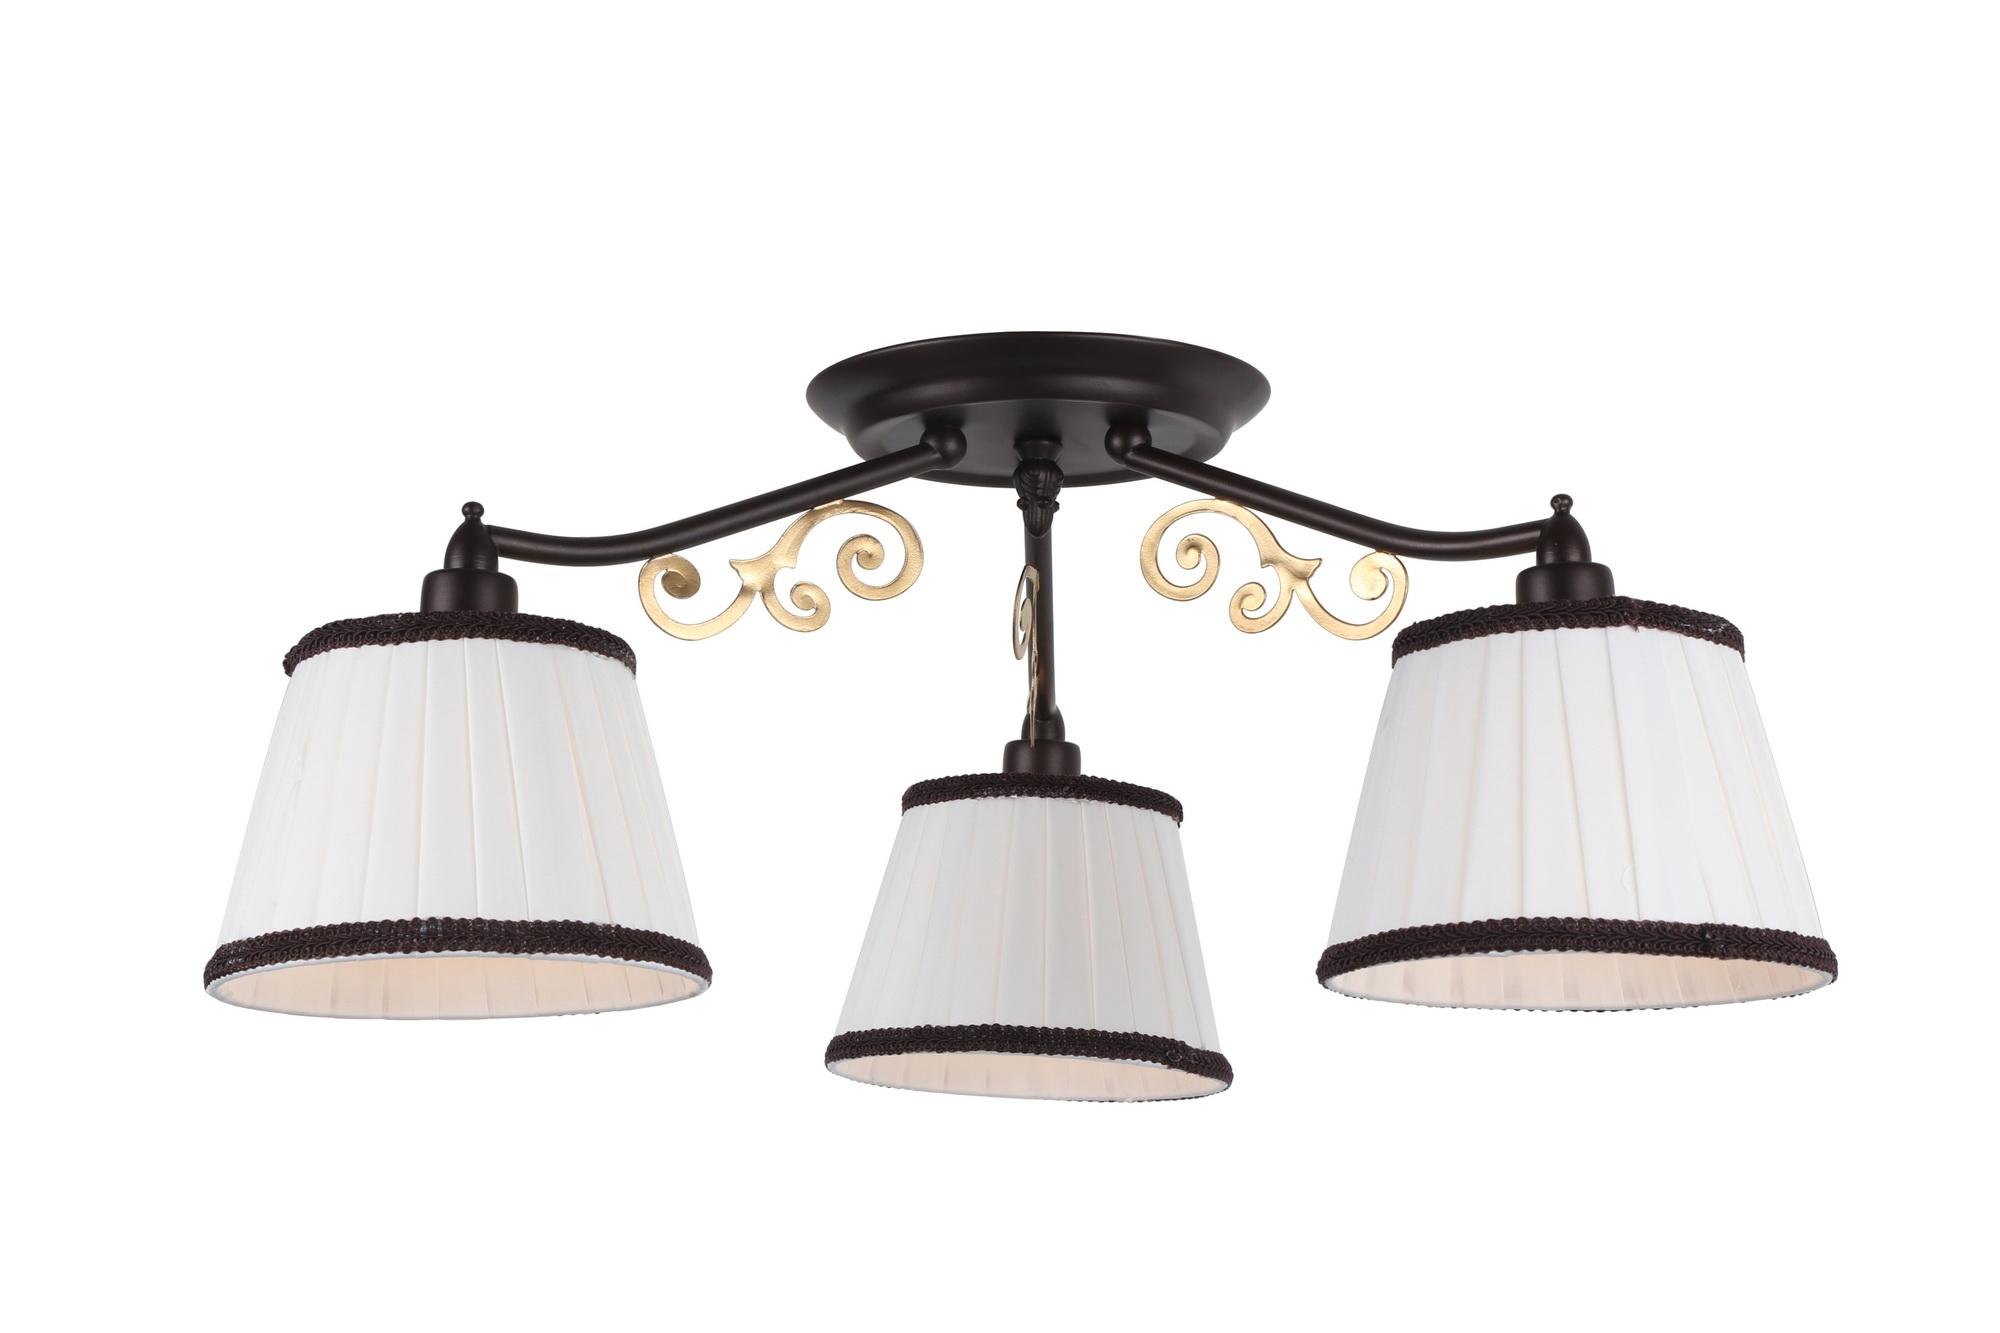 Люстра Arte lampЛюстры<br>Назначение светильника: для комнаты,<br>Стиль светильника: модерн,<br>Тип: потолочная,<br>Материал светильника: металл, ткань,<br>Материал плафона: ткань,<br>Материал арматуры: металл,<br>Длина (мм): 550,<br>Ширина: 550,<br>Высота: 230,<br>Количество ламп: 3,<br>Тип лампы: накаливания,<br>Мощность: 40,<br>Патрон: Е14,<br>Цвет арматуры: дерево<br>